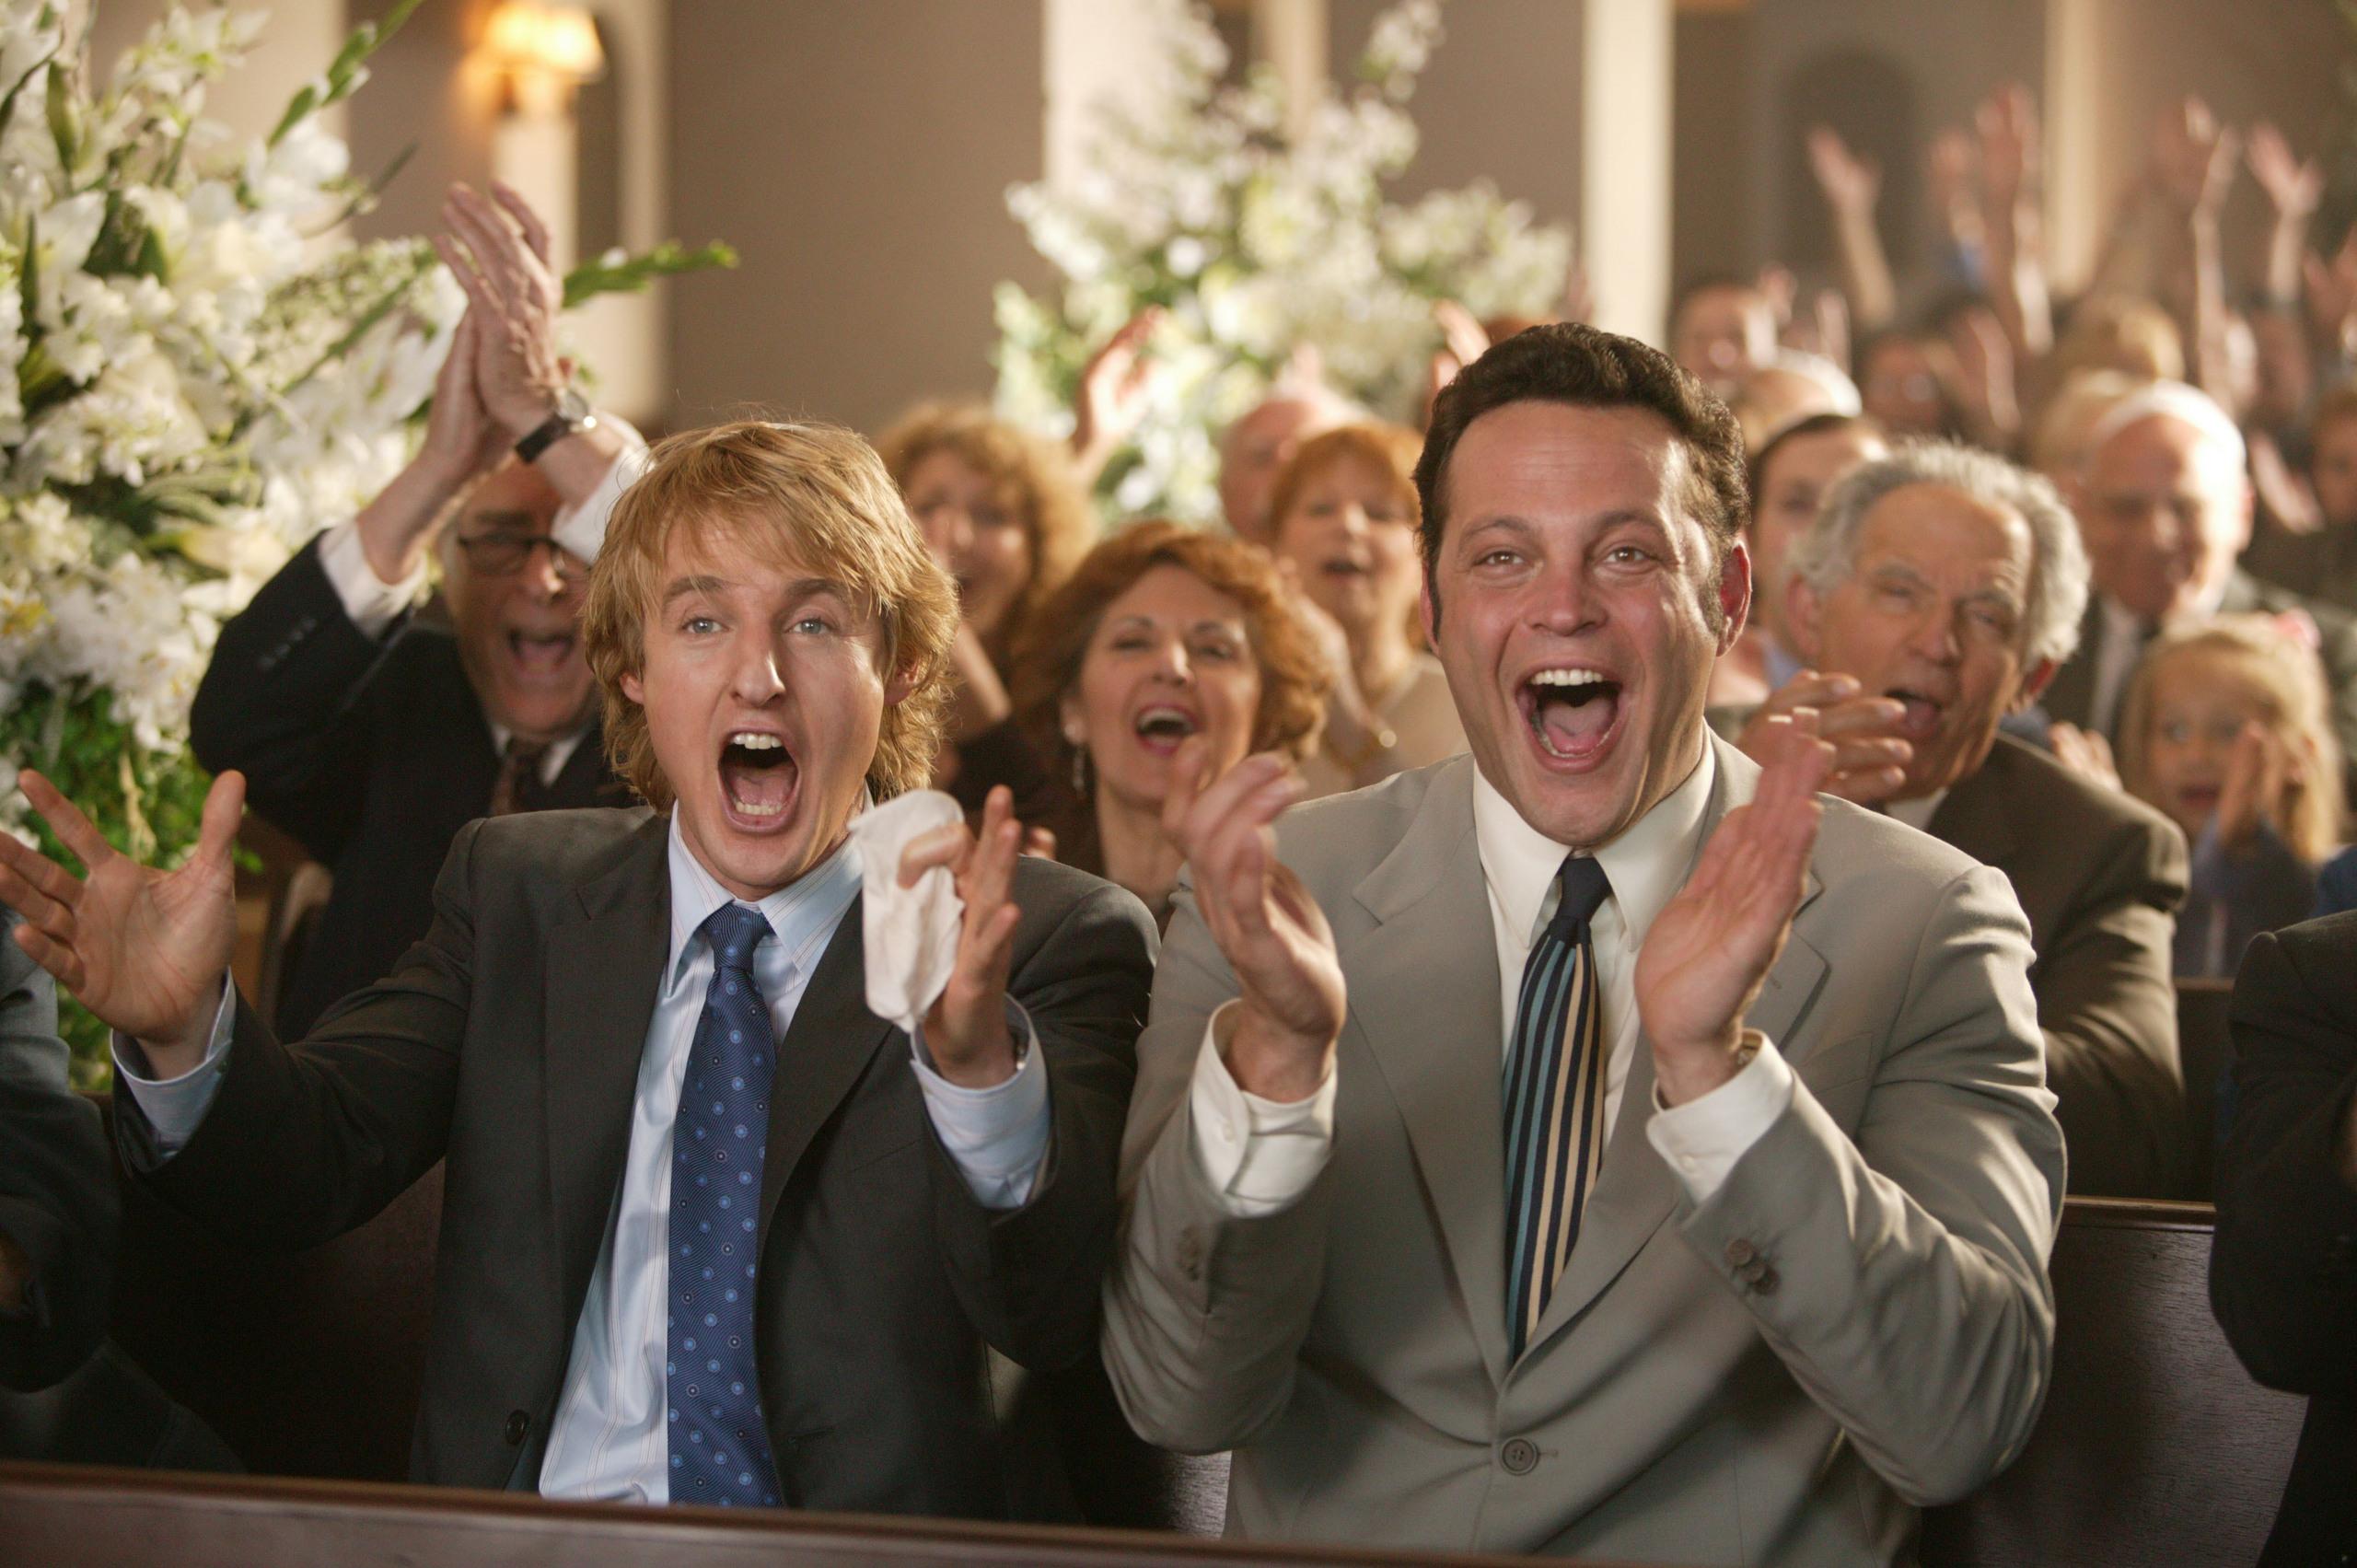 wedding crashers movie wallpaper 63085